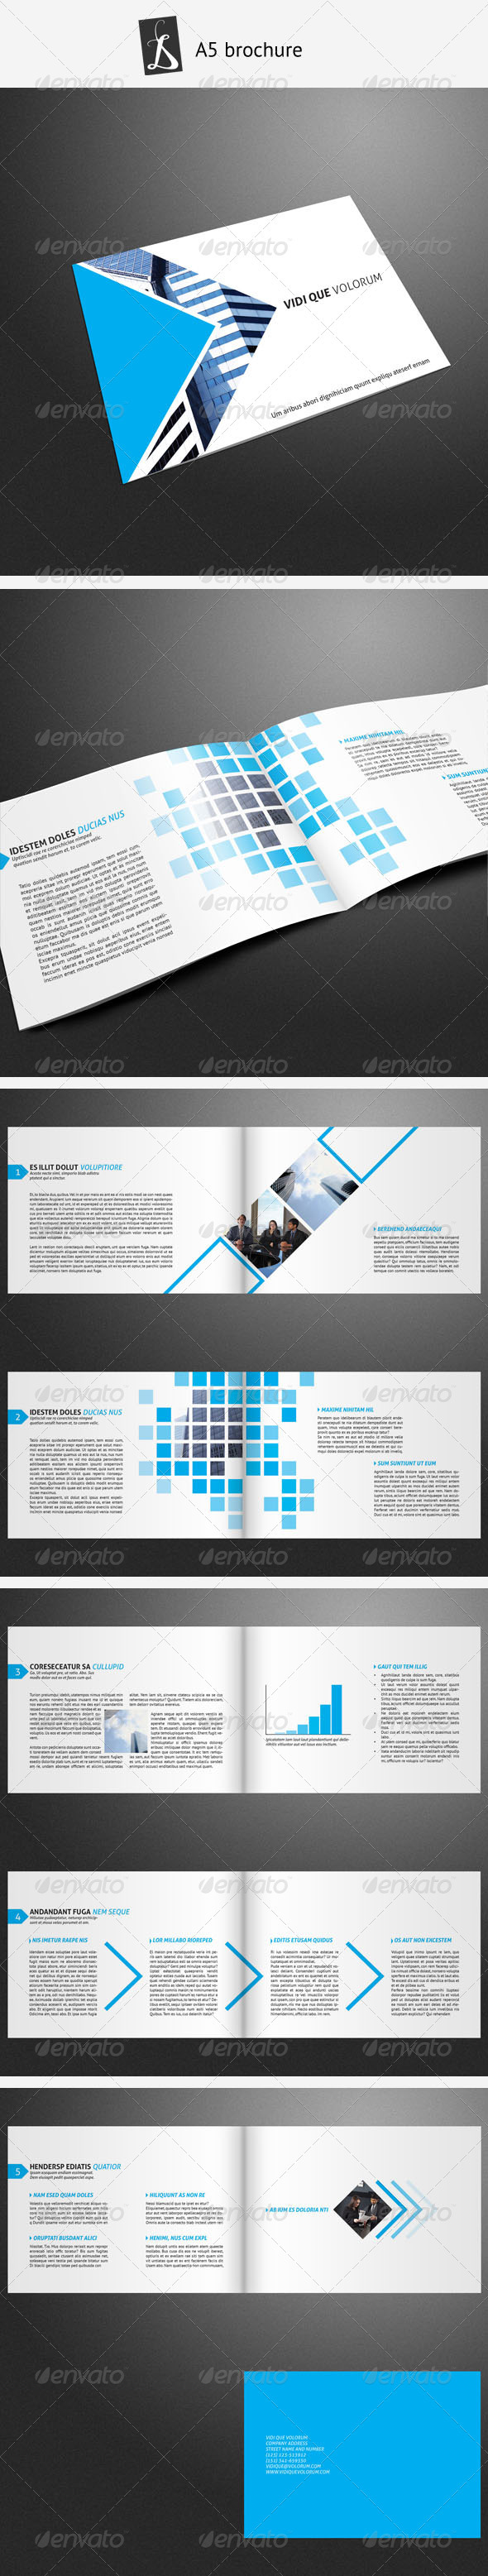 A5 brochure 7 - Corporate Brochures